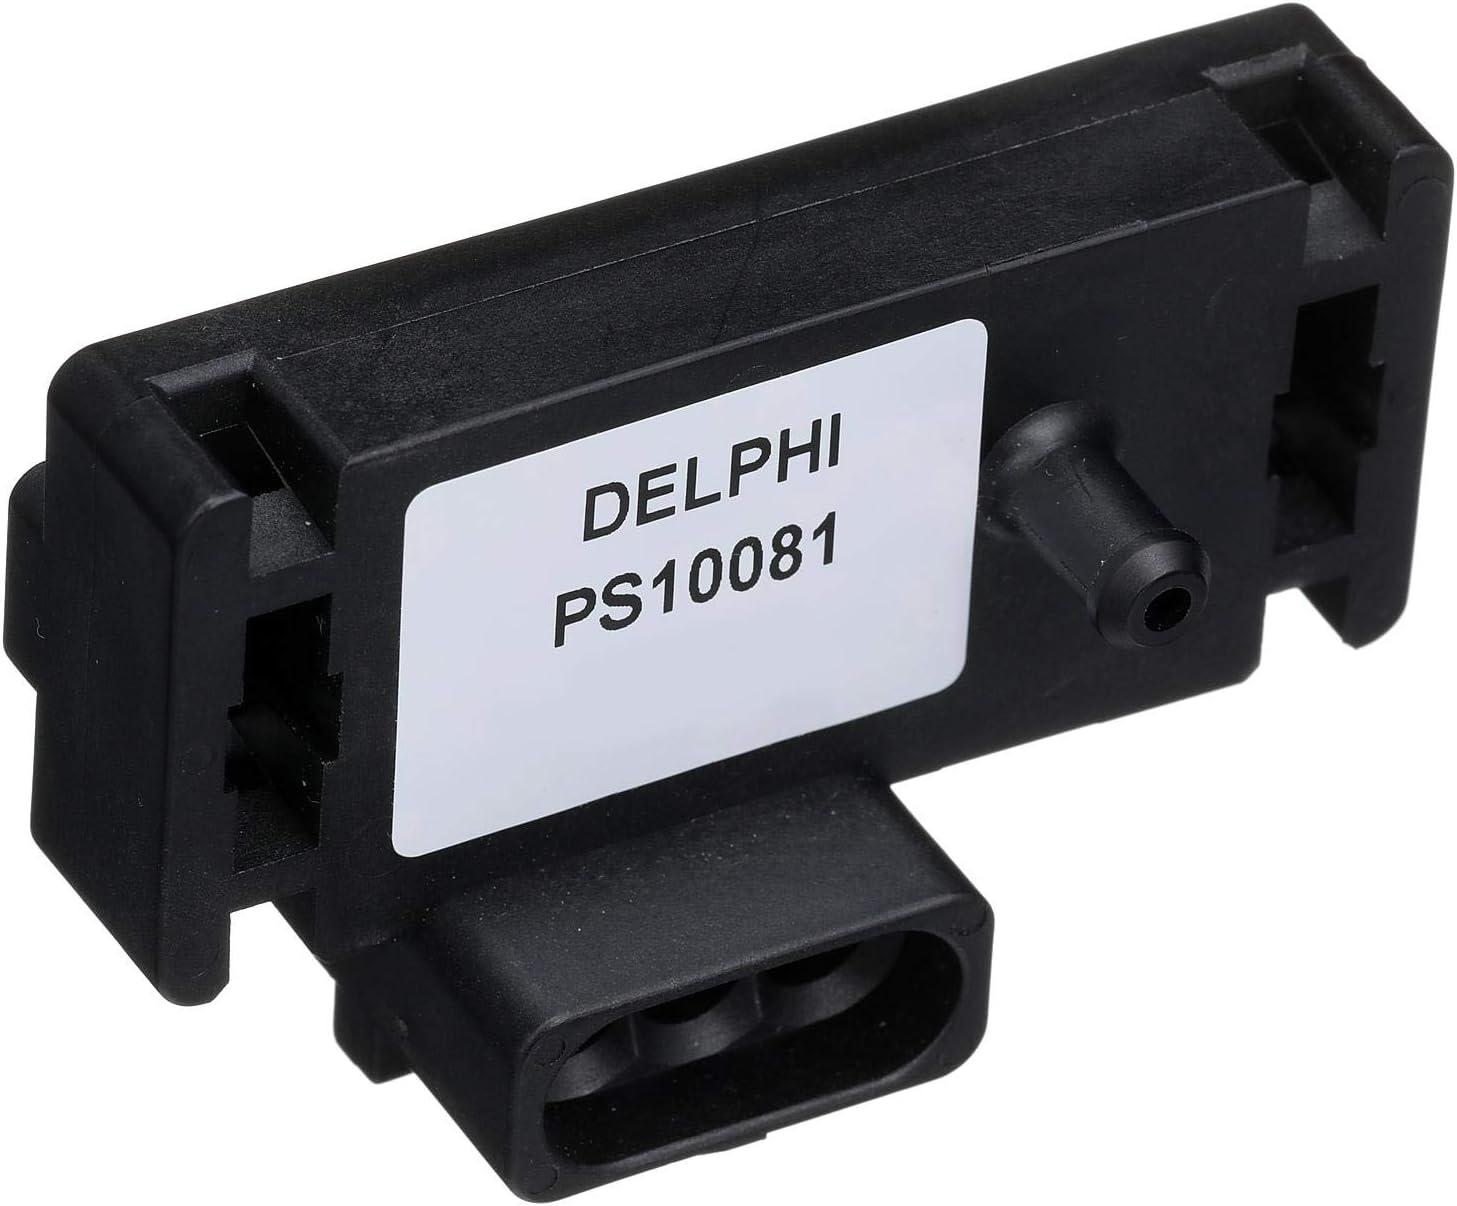 Delphi PS10081 Manifold Absolute Super sale period limited Max 78% OFF Sensor MAP Pressure